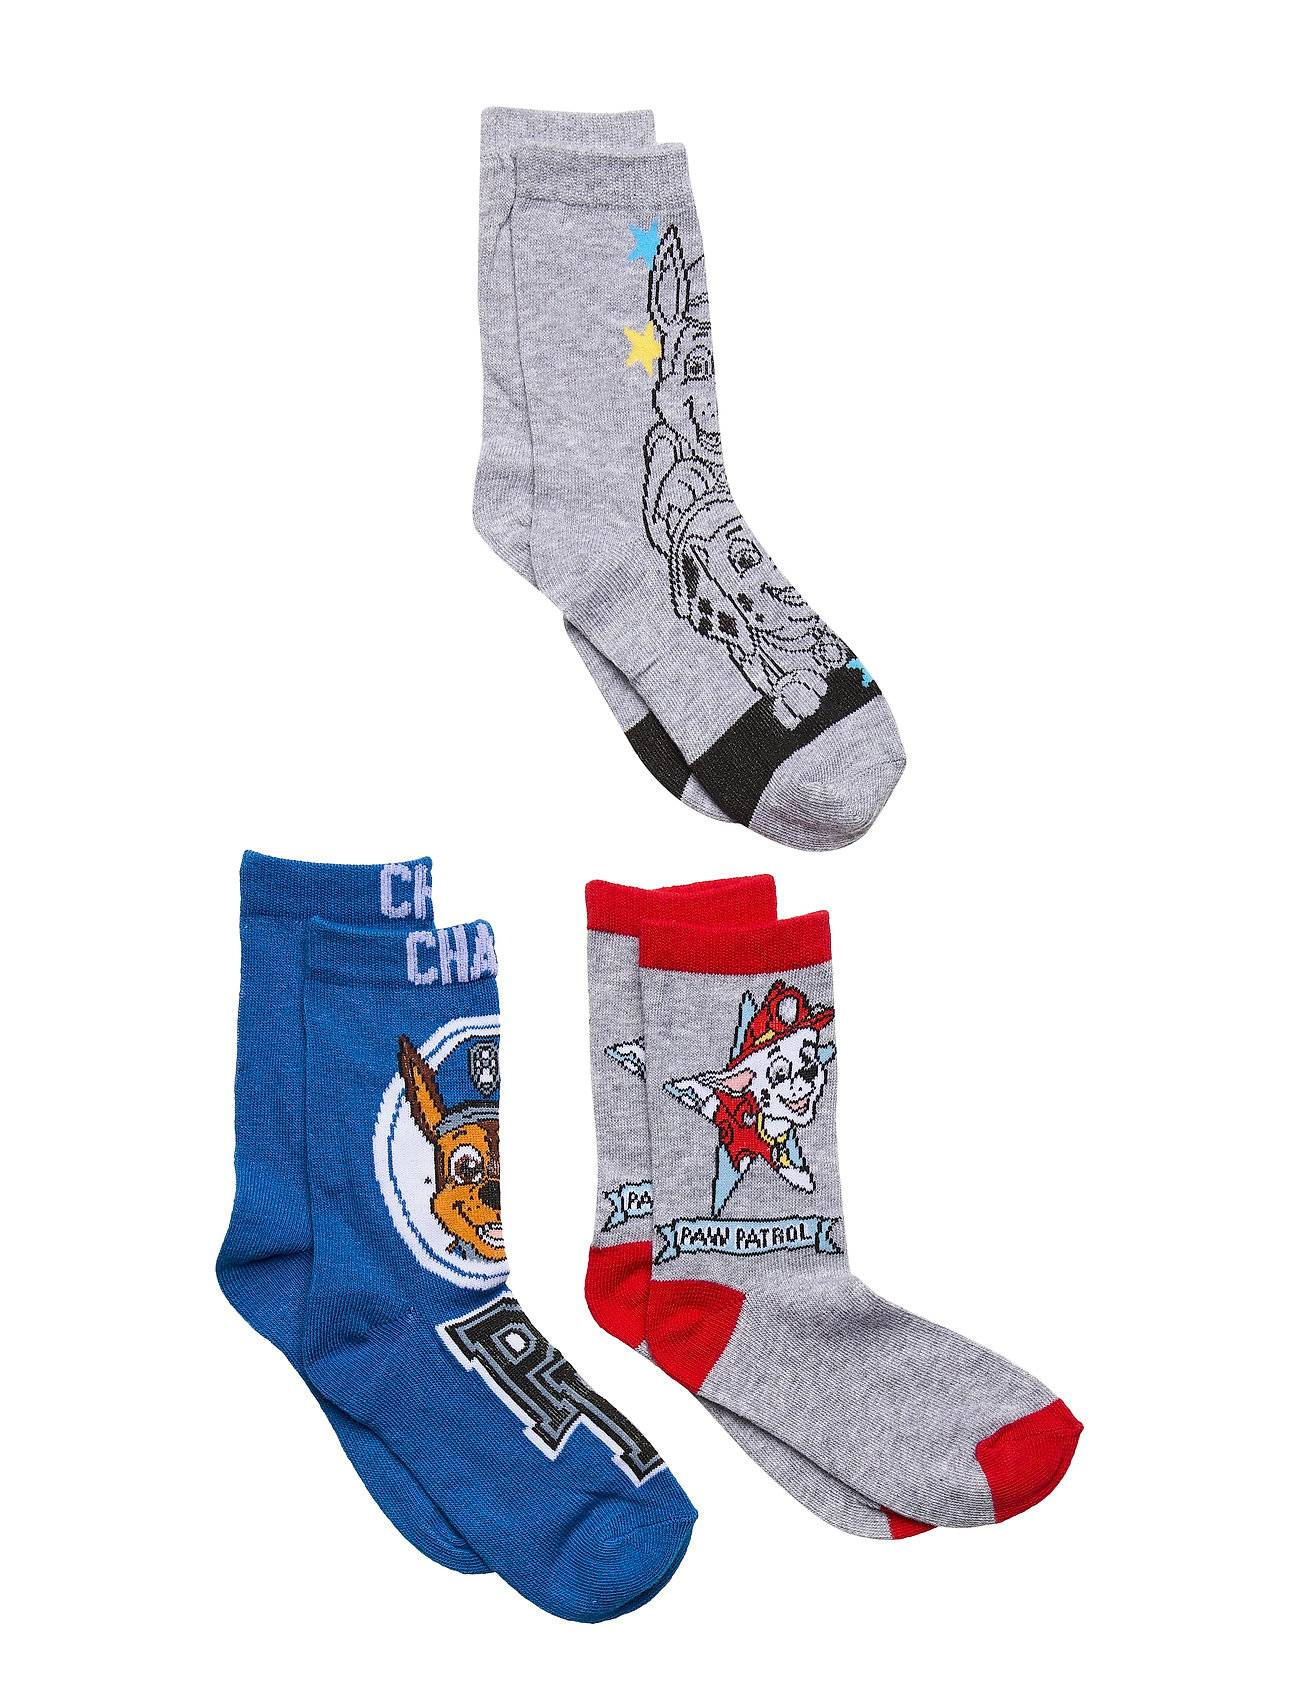 Paw Patrol Pack 3 Socks Sukat Monivärinen/Kuvioitu Paw Patrol